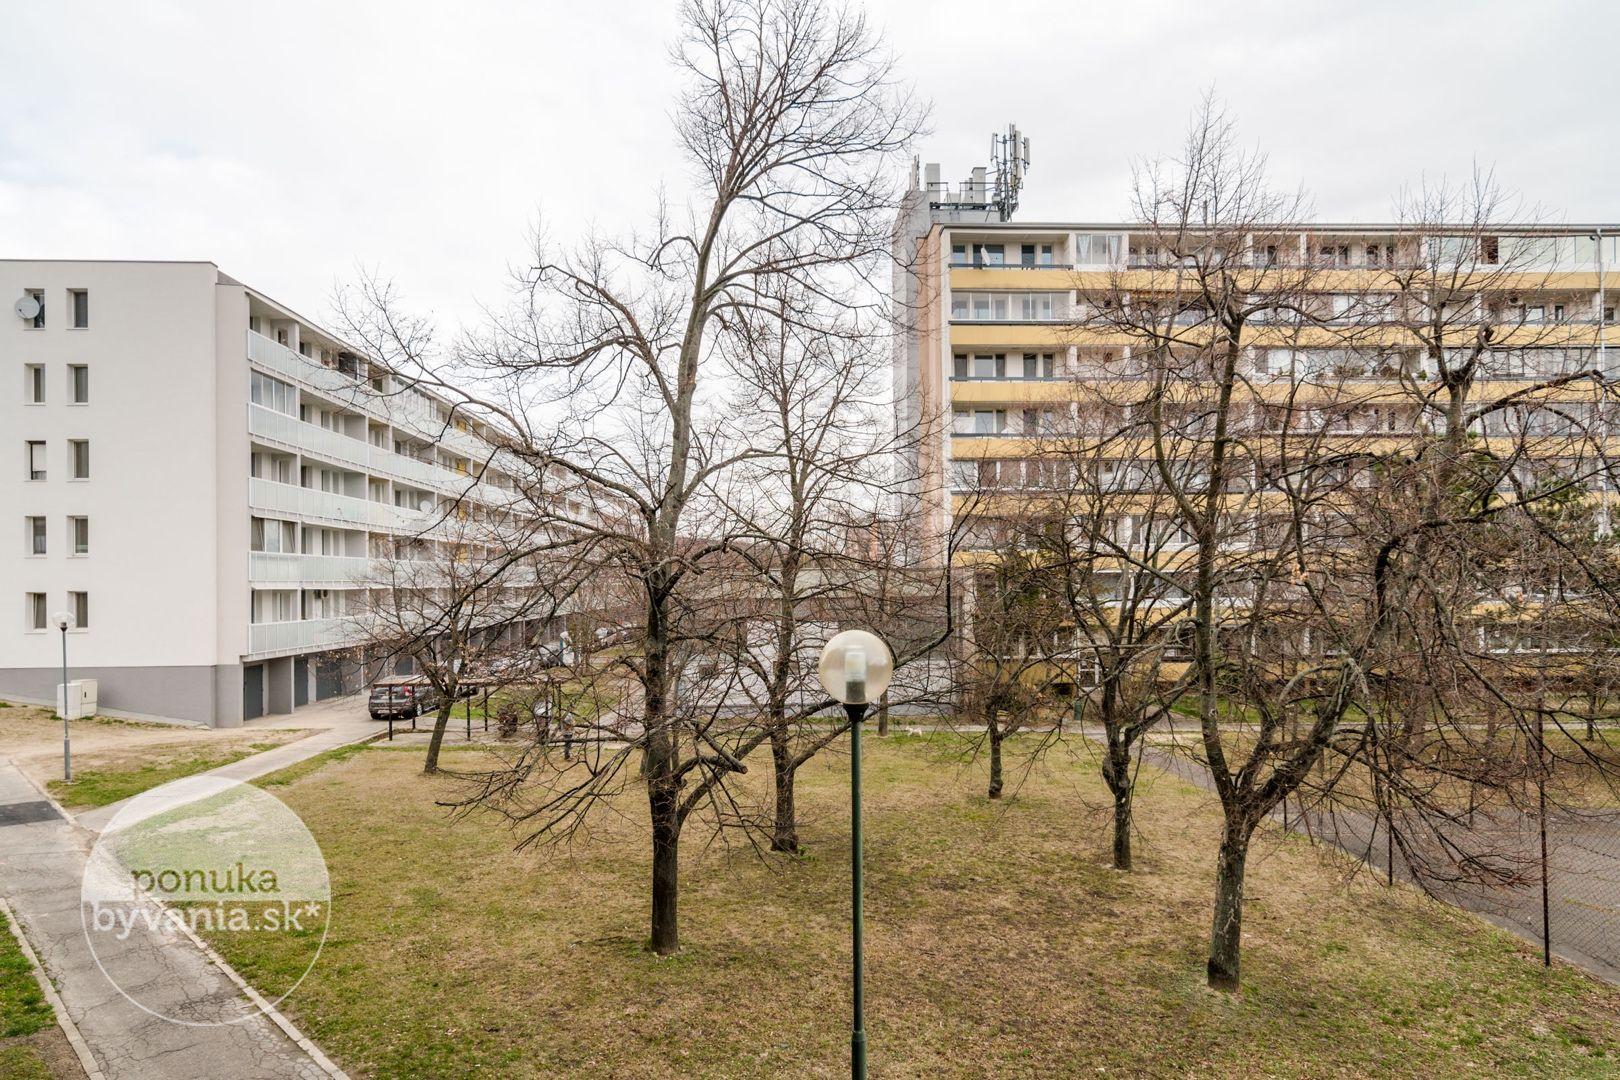 ponukabyvania.sk_Novohorská_1-izbový-byt_BEREC